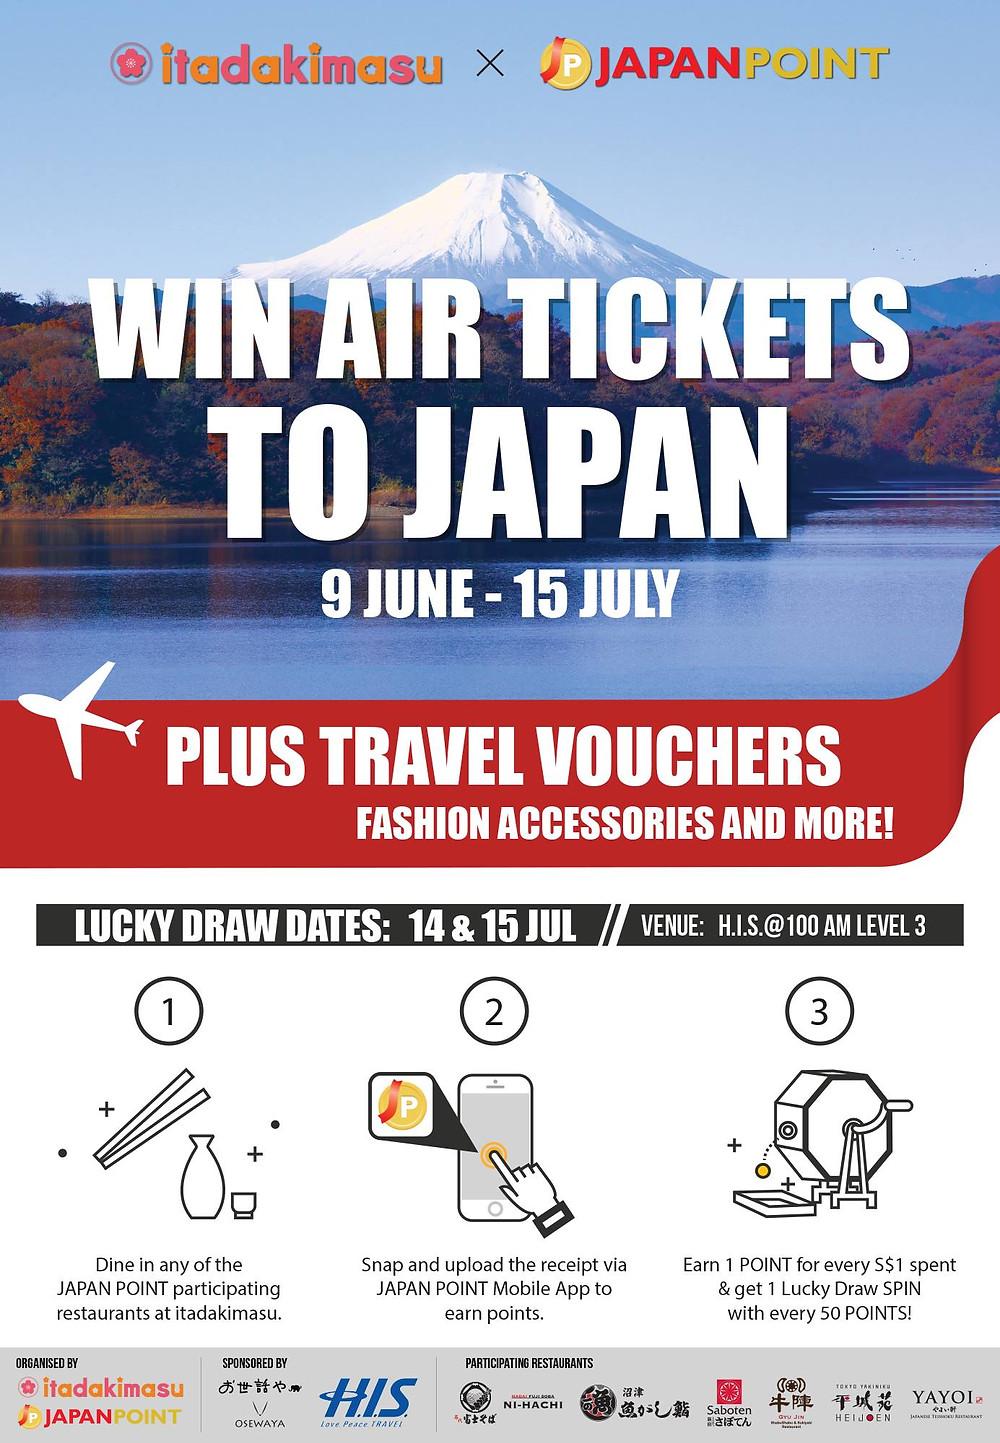 itadakimasu x Japan Point Lucky Draw Jun-Jul 2017